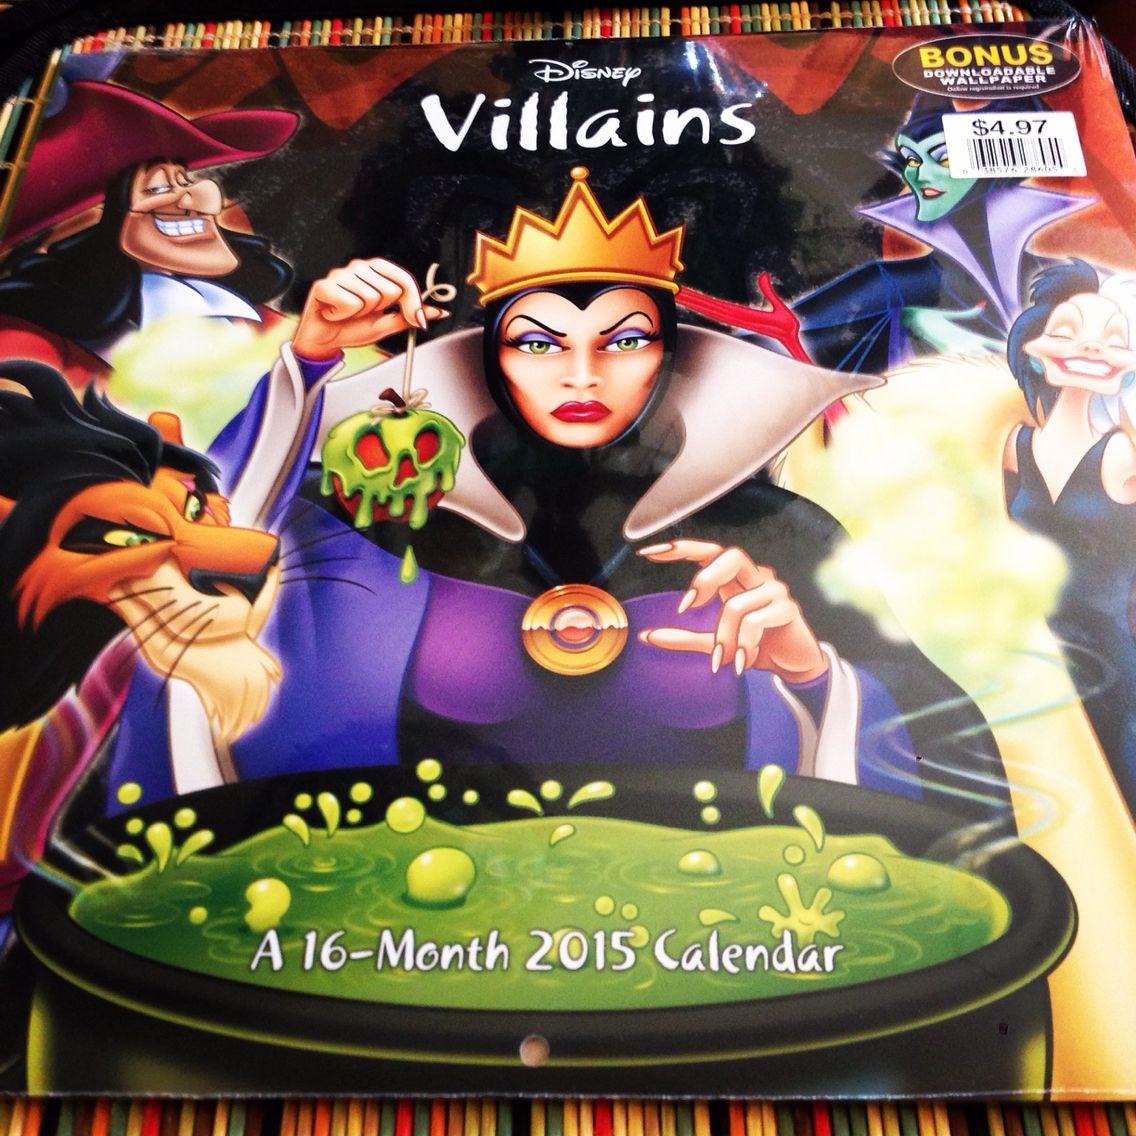 Disney Villians 2015 Calendar